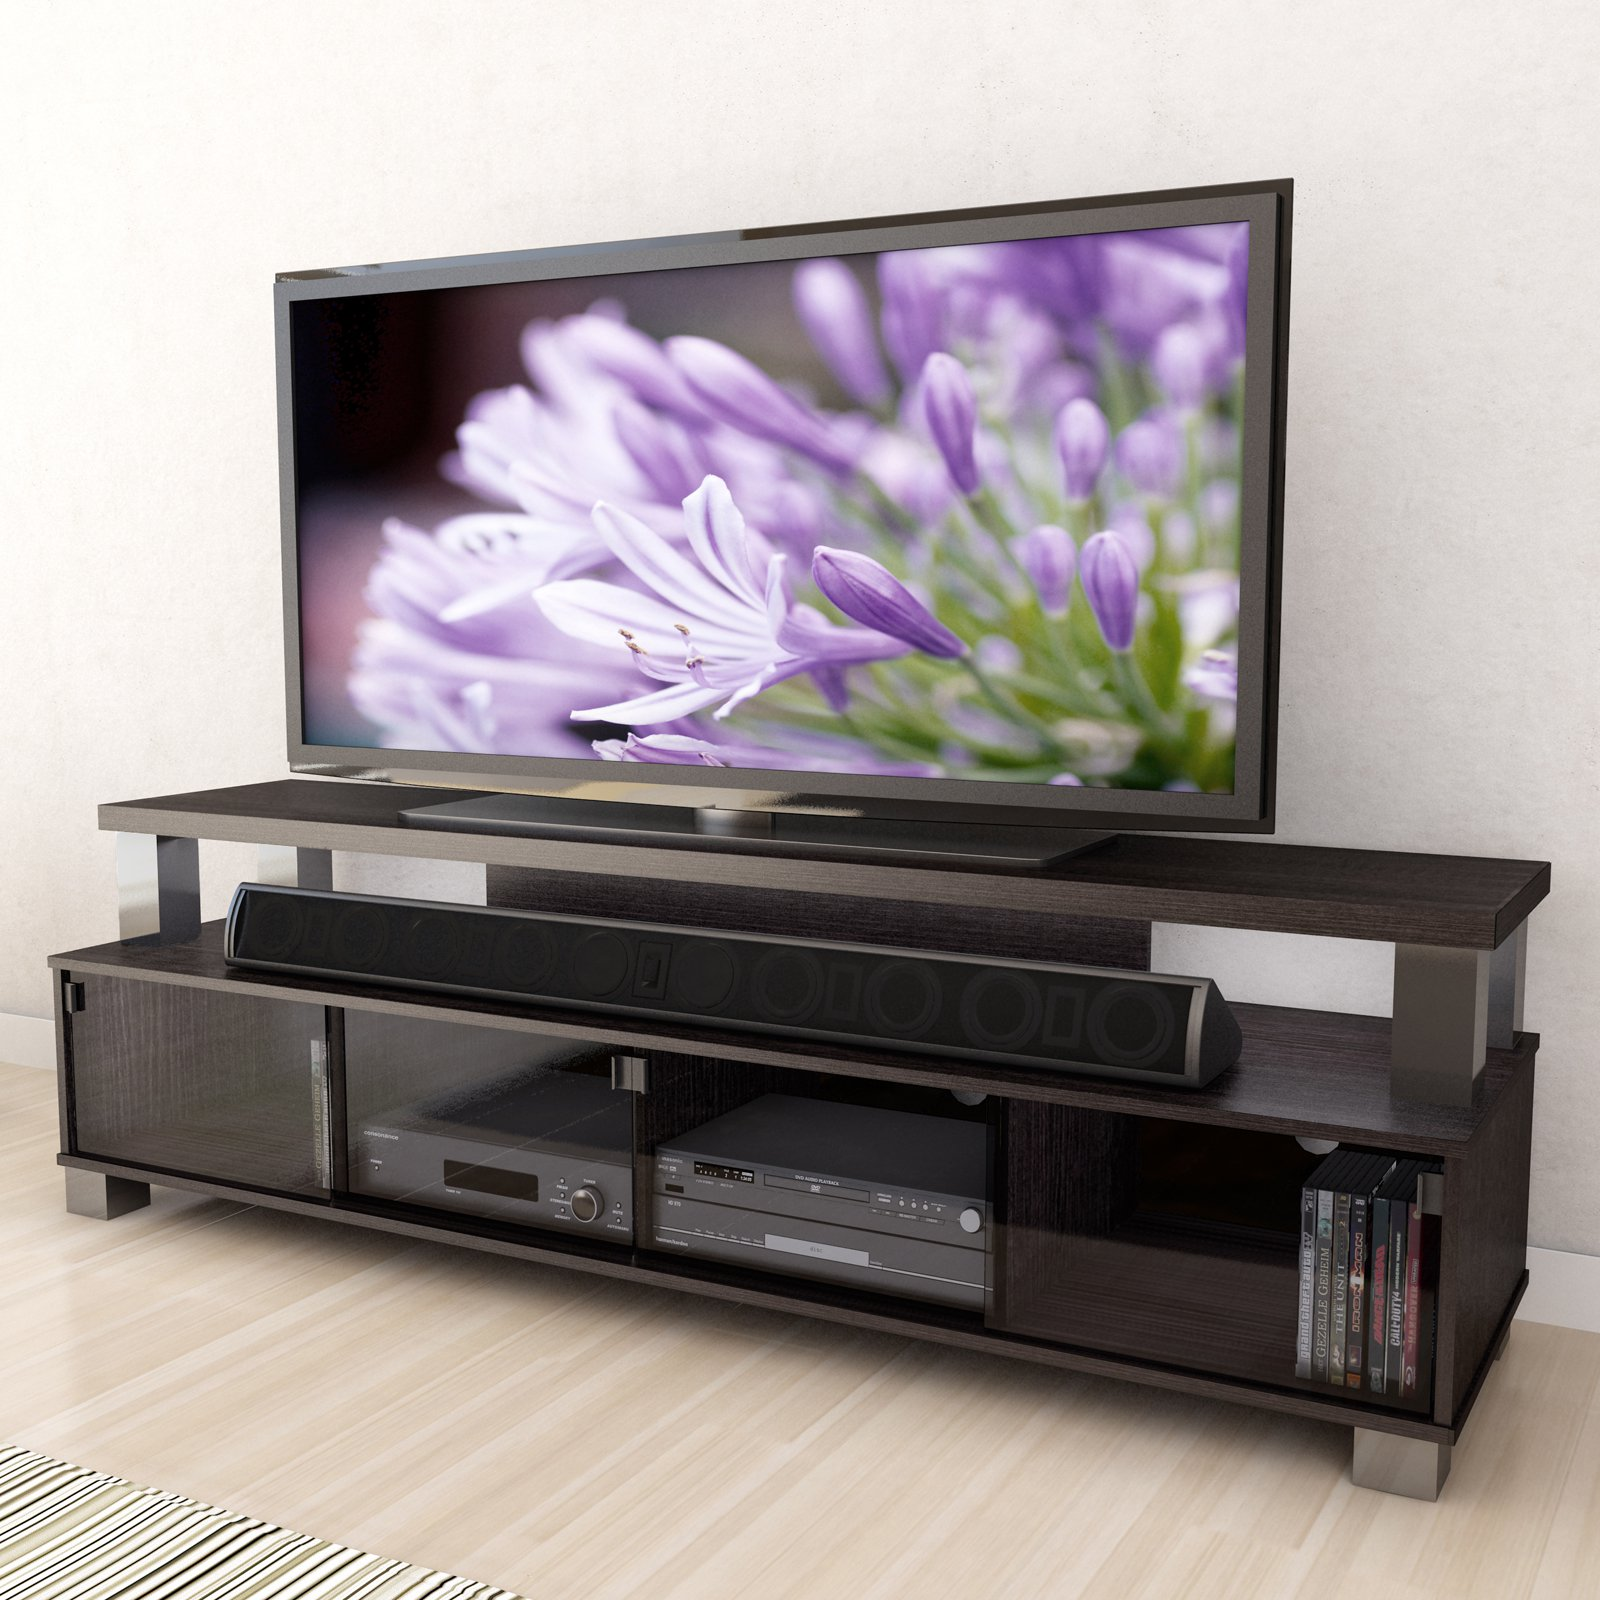 "Sonax Bromley 75"" Ravenwood Black 2-Tier TV Stand - B-003-RBT ..."